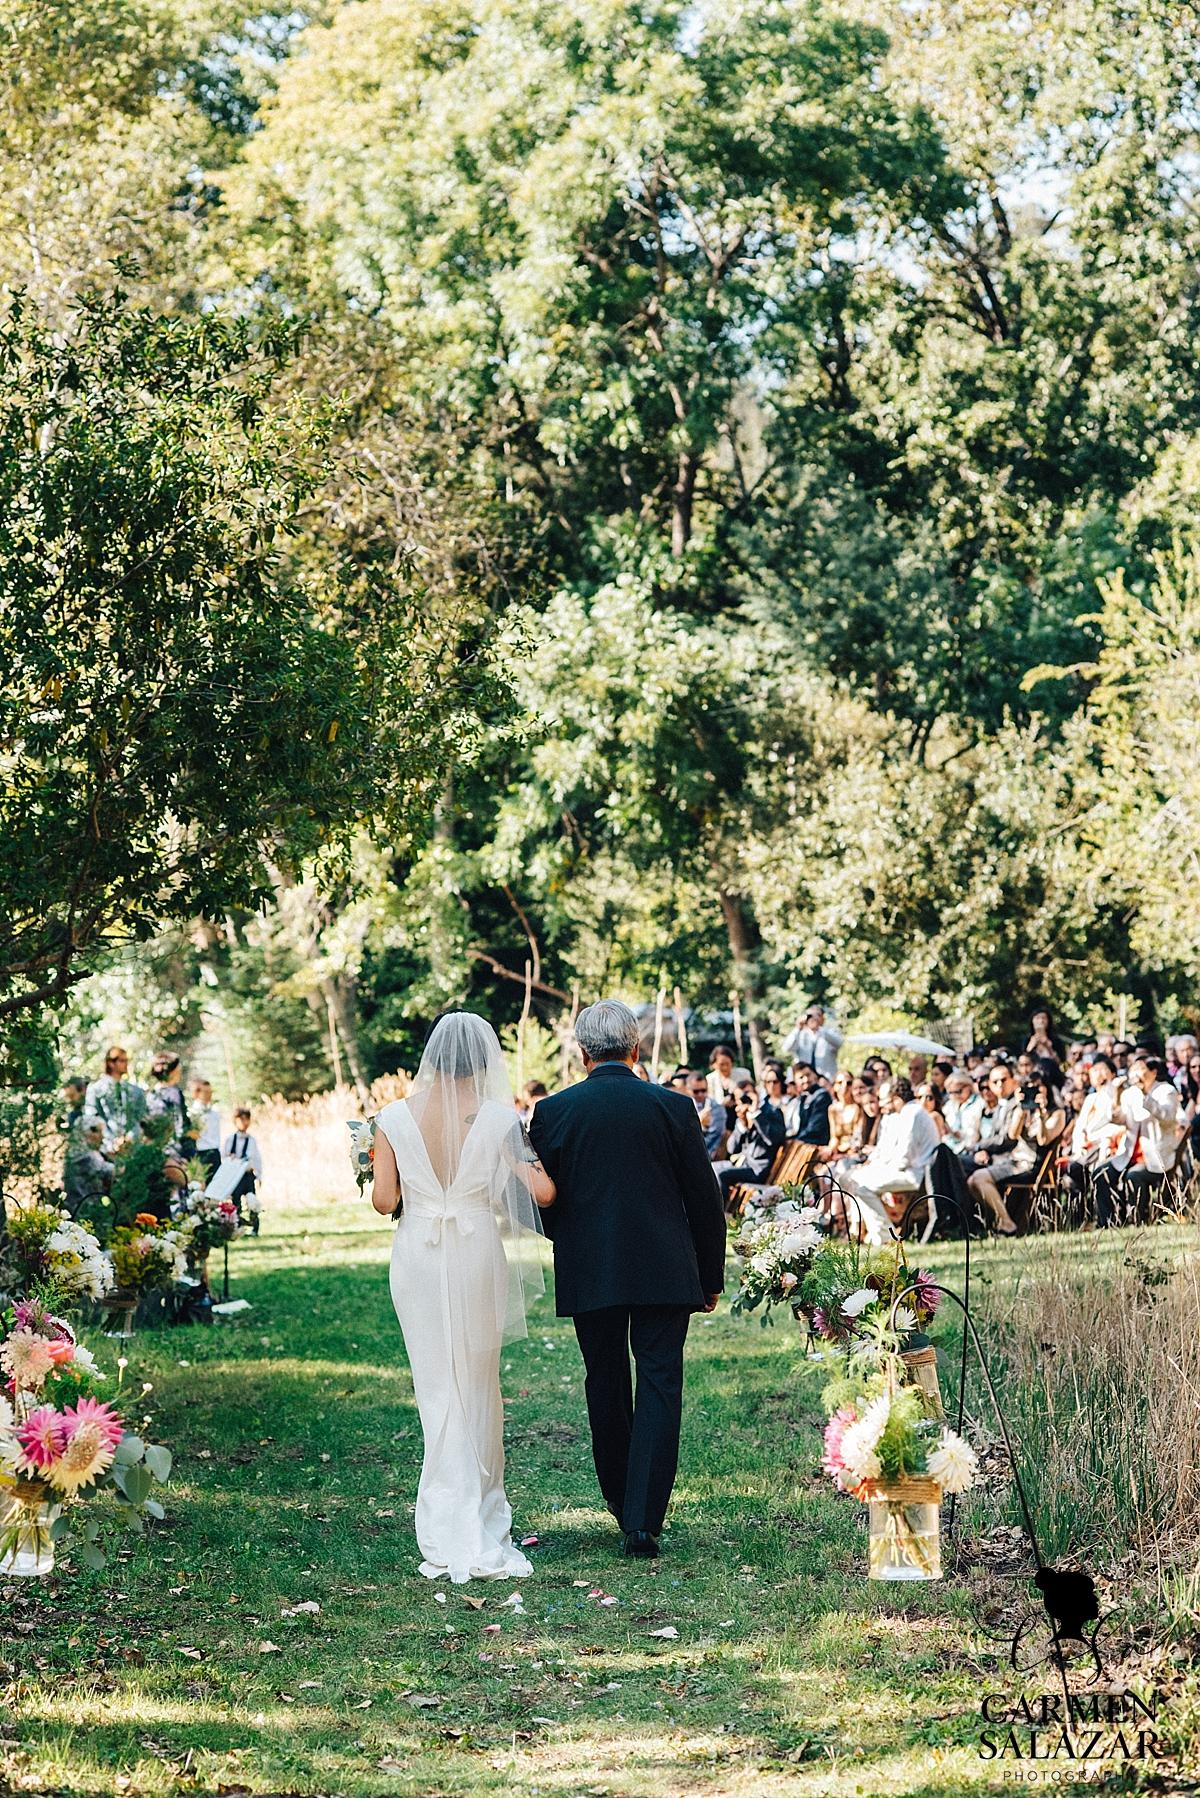 Father walking bride down floral aisle - Carmen Salazar